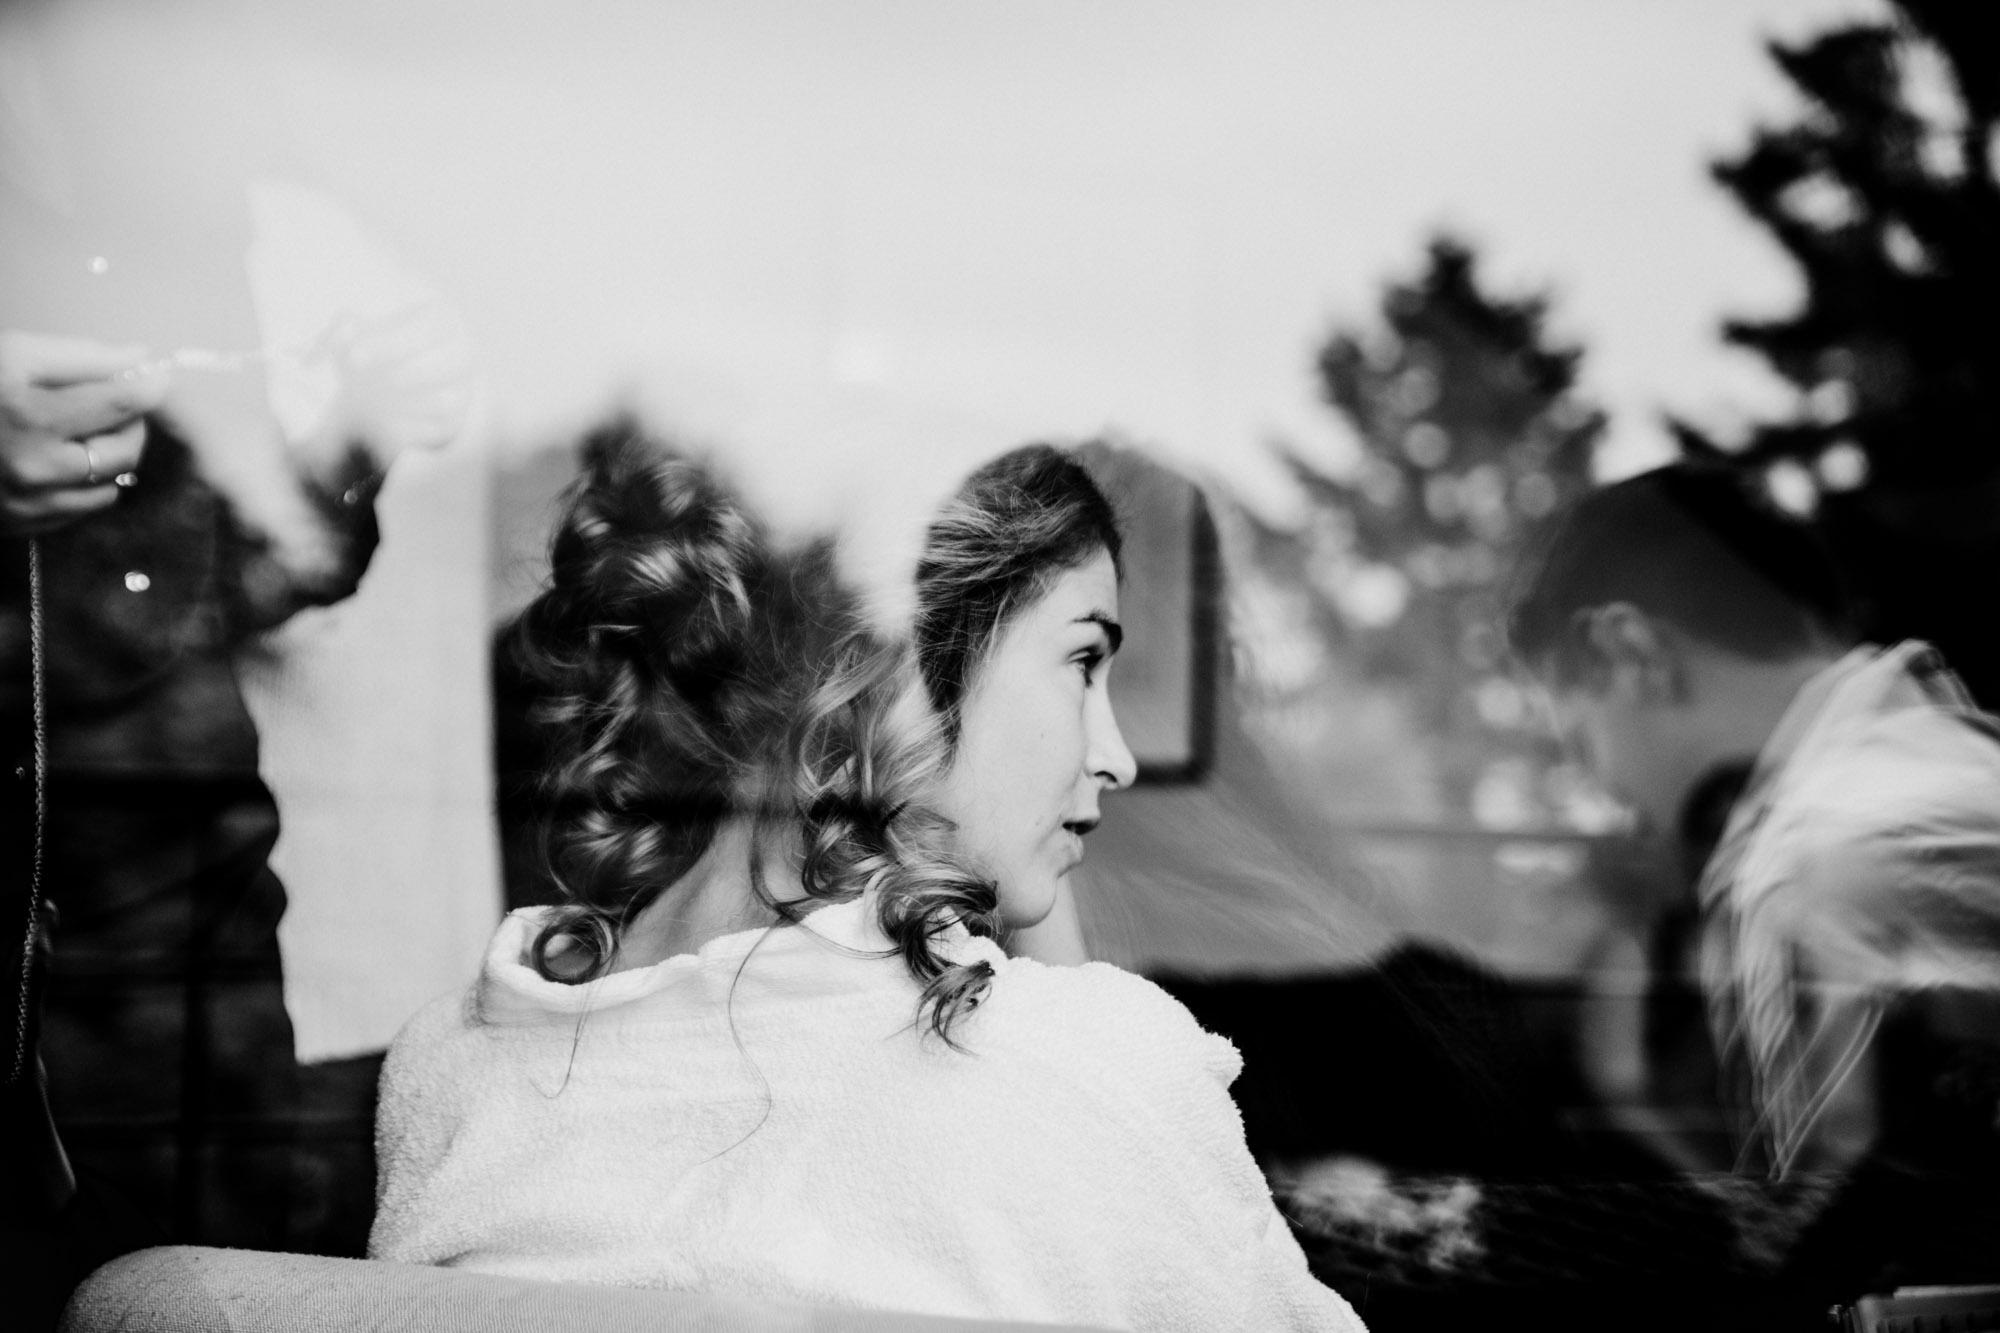 2018-09-29 - LD8_0396 - photographe mariage lyon - laurie diaz - www.lauriediazweeding.com.jpg